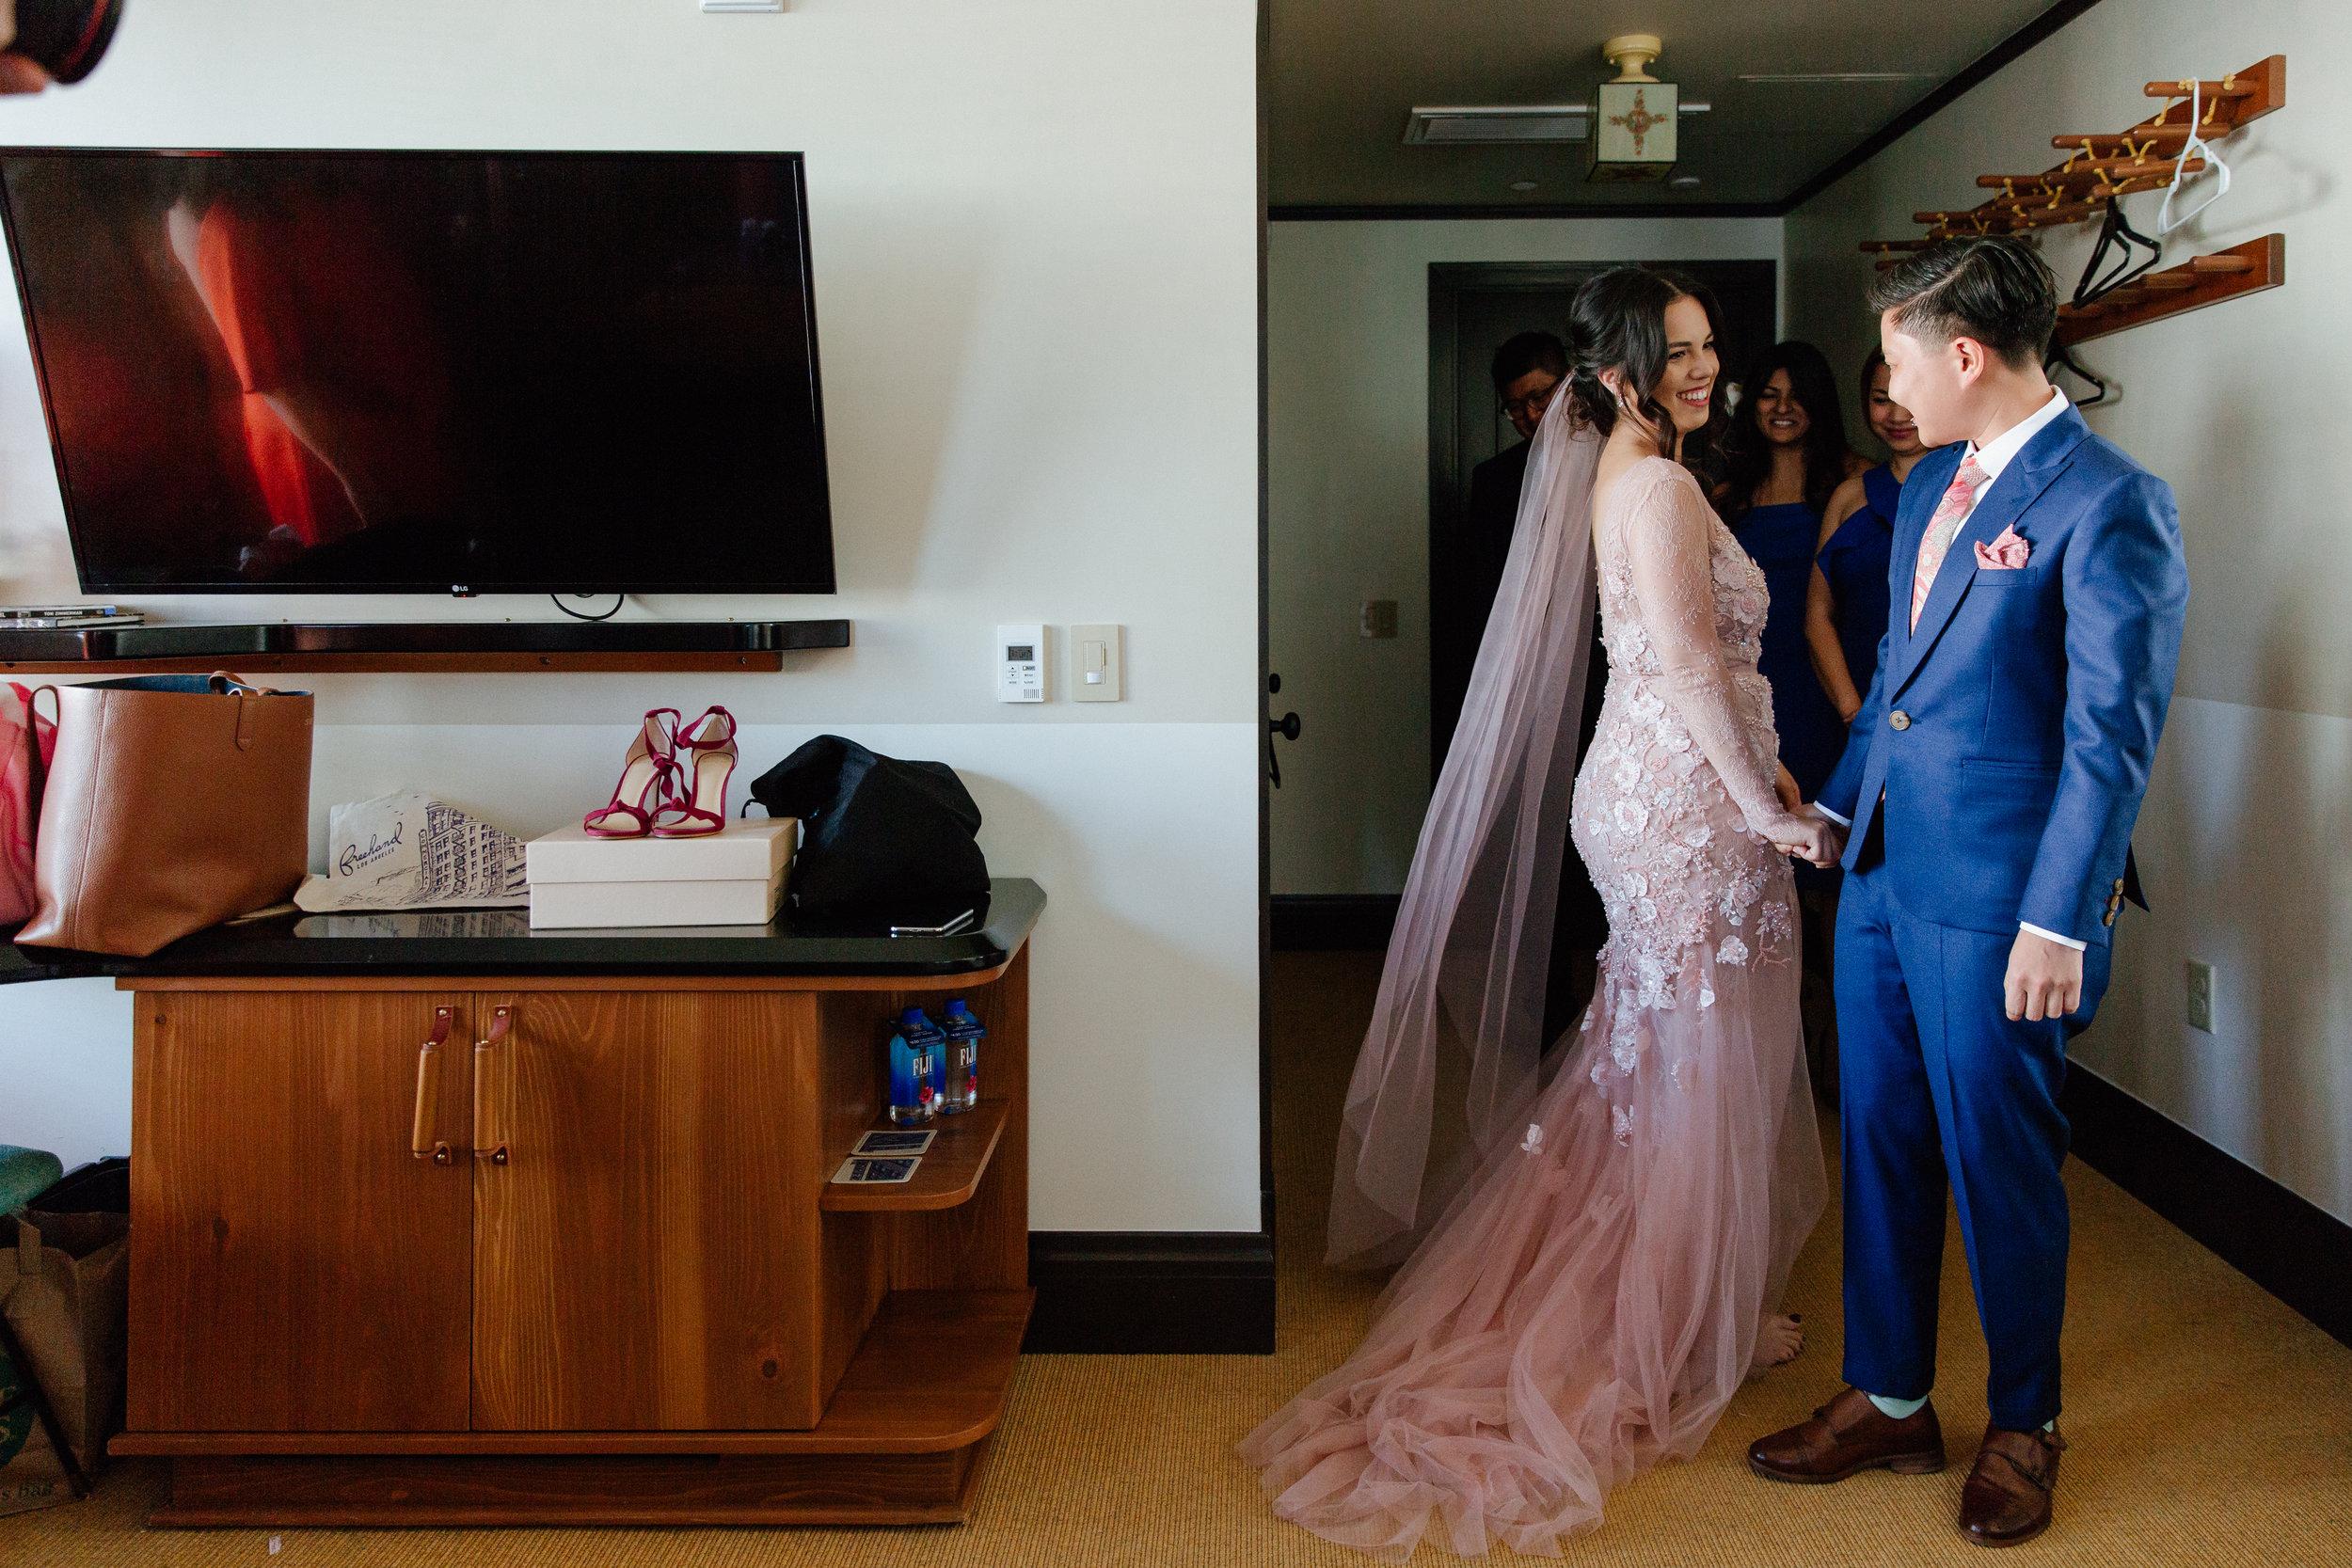 millwick-wedding-marble-rye-photography-030118-gettingready-089.jpg